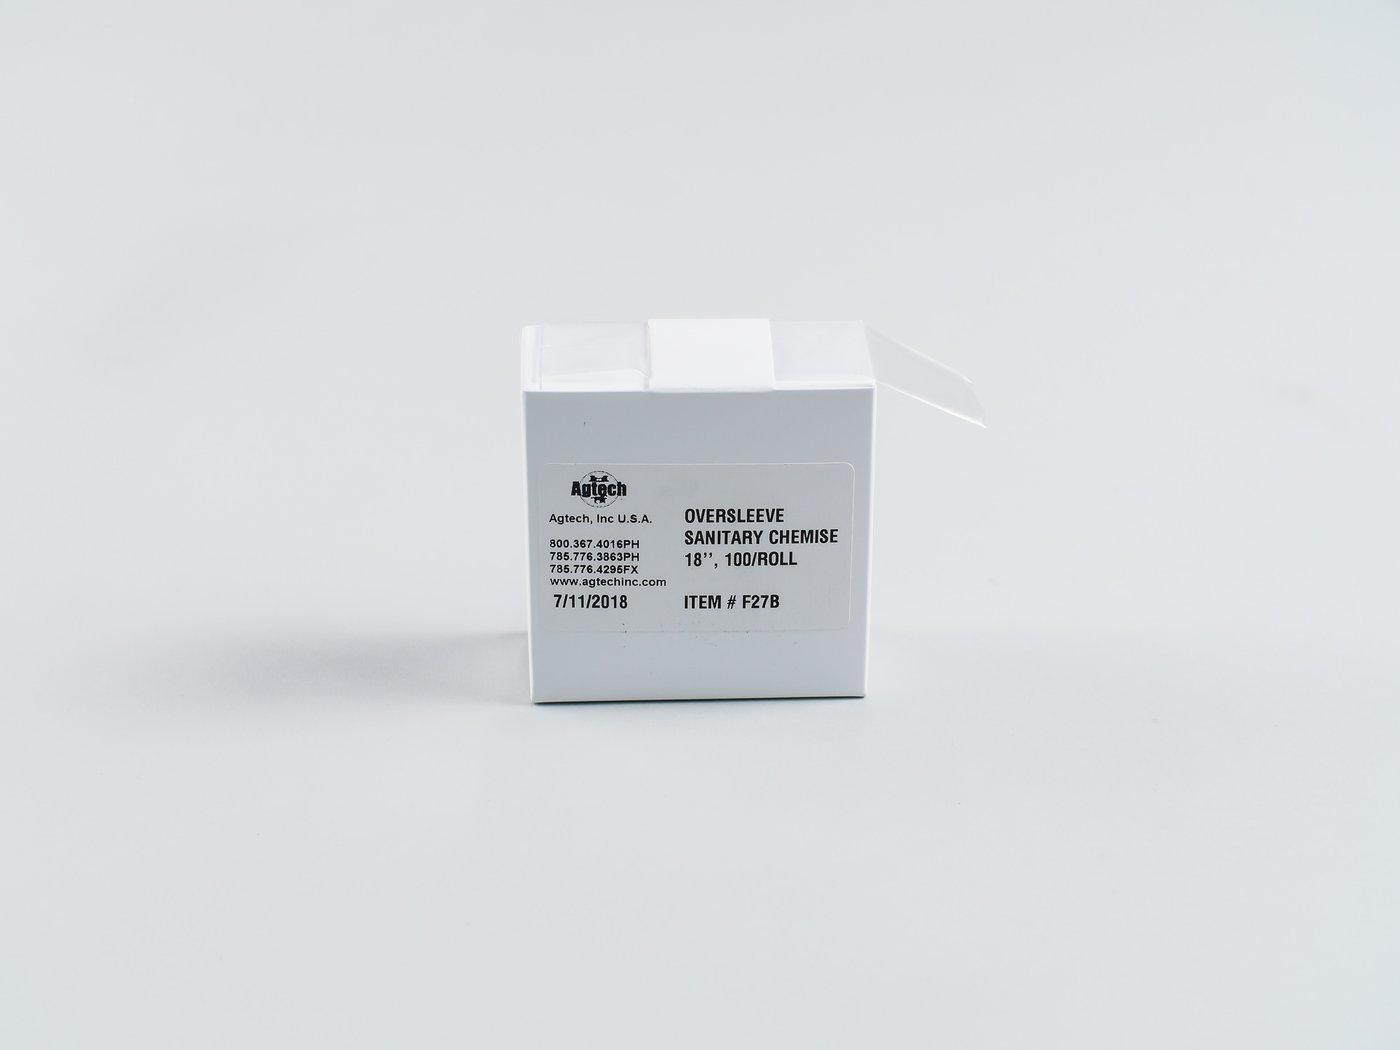 agtech chemise 18100roll imv